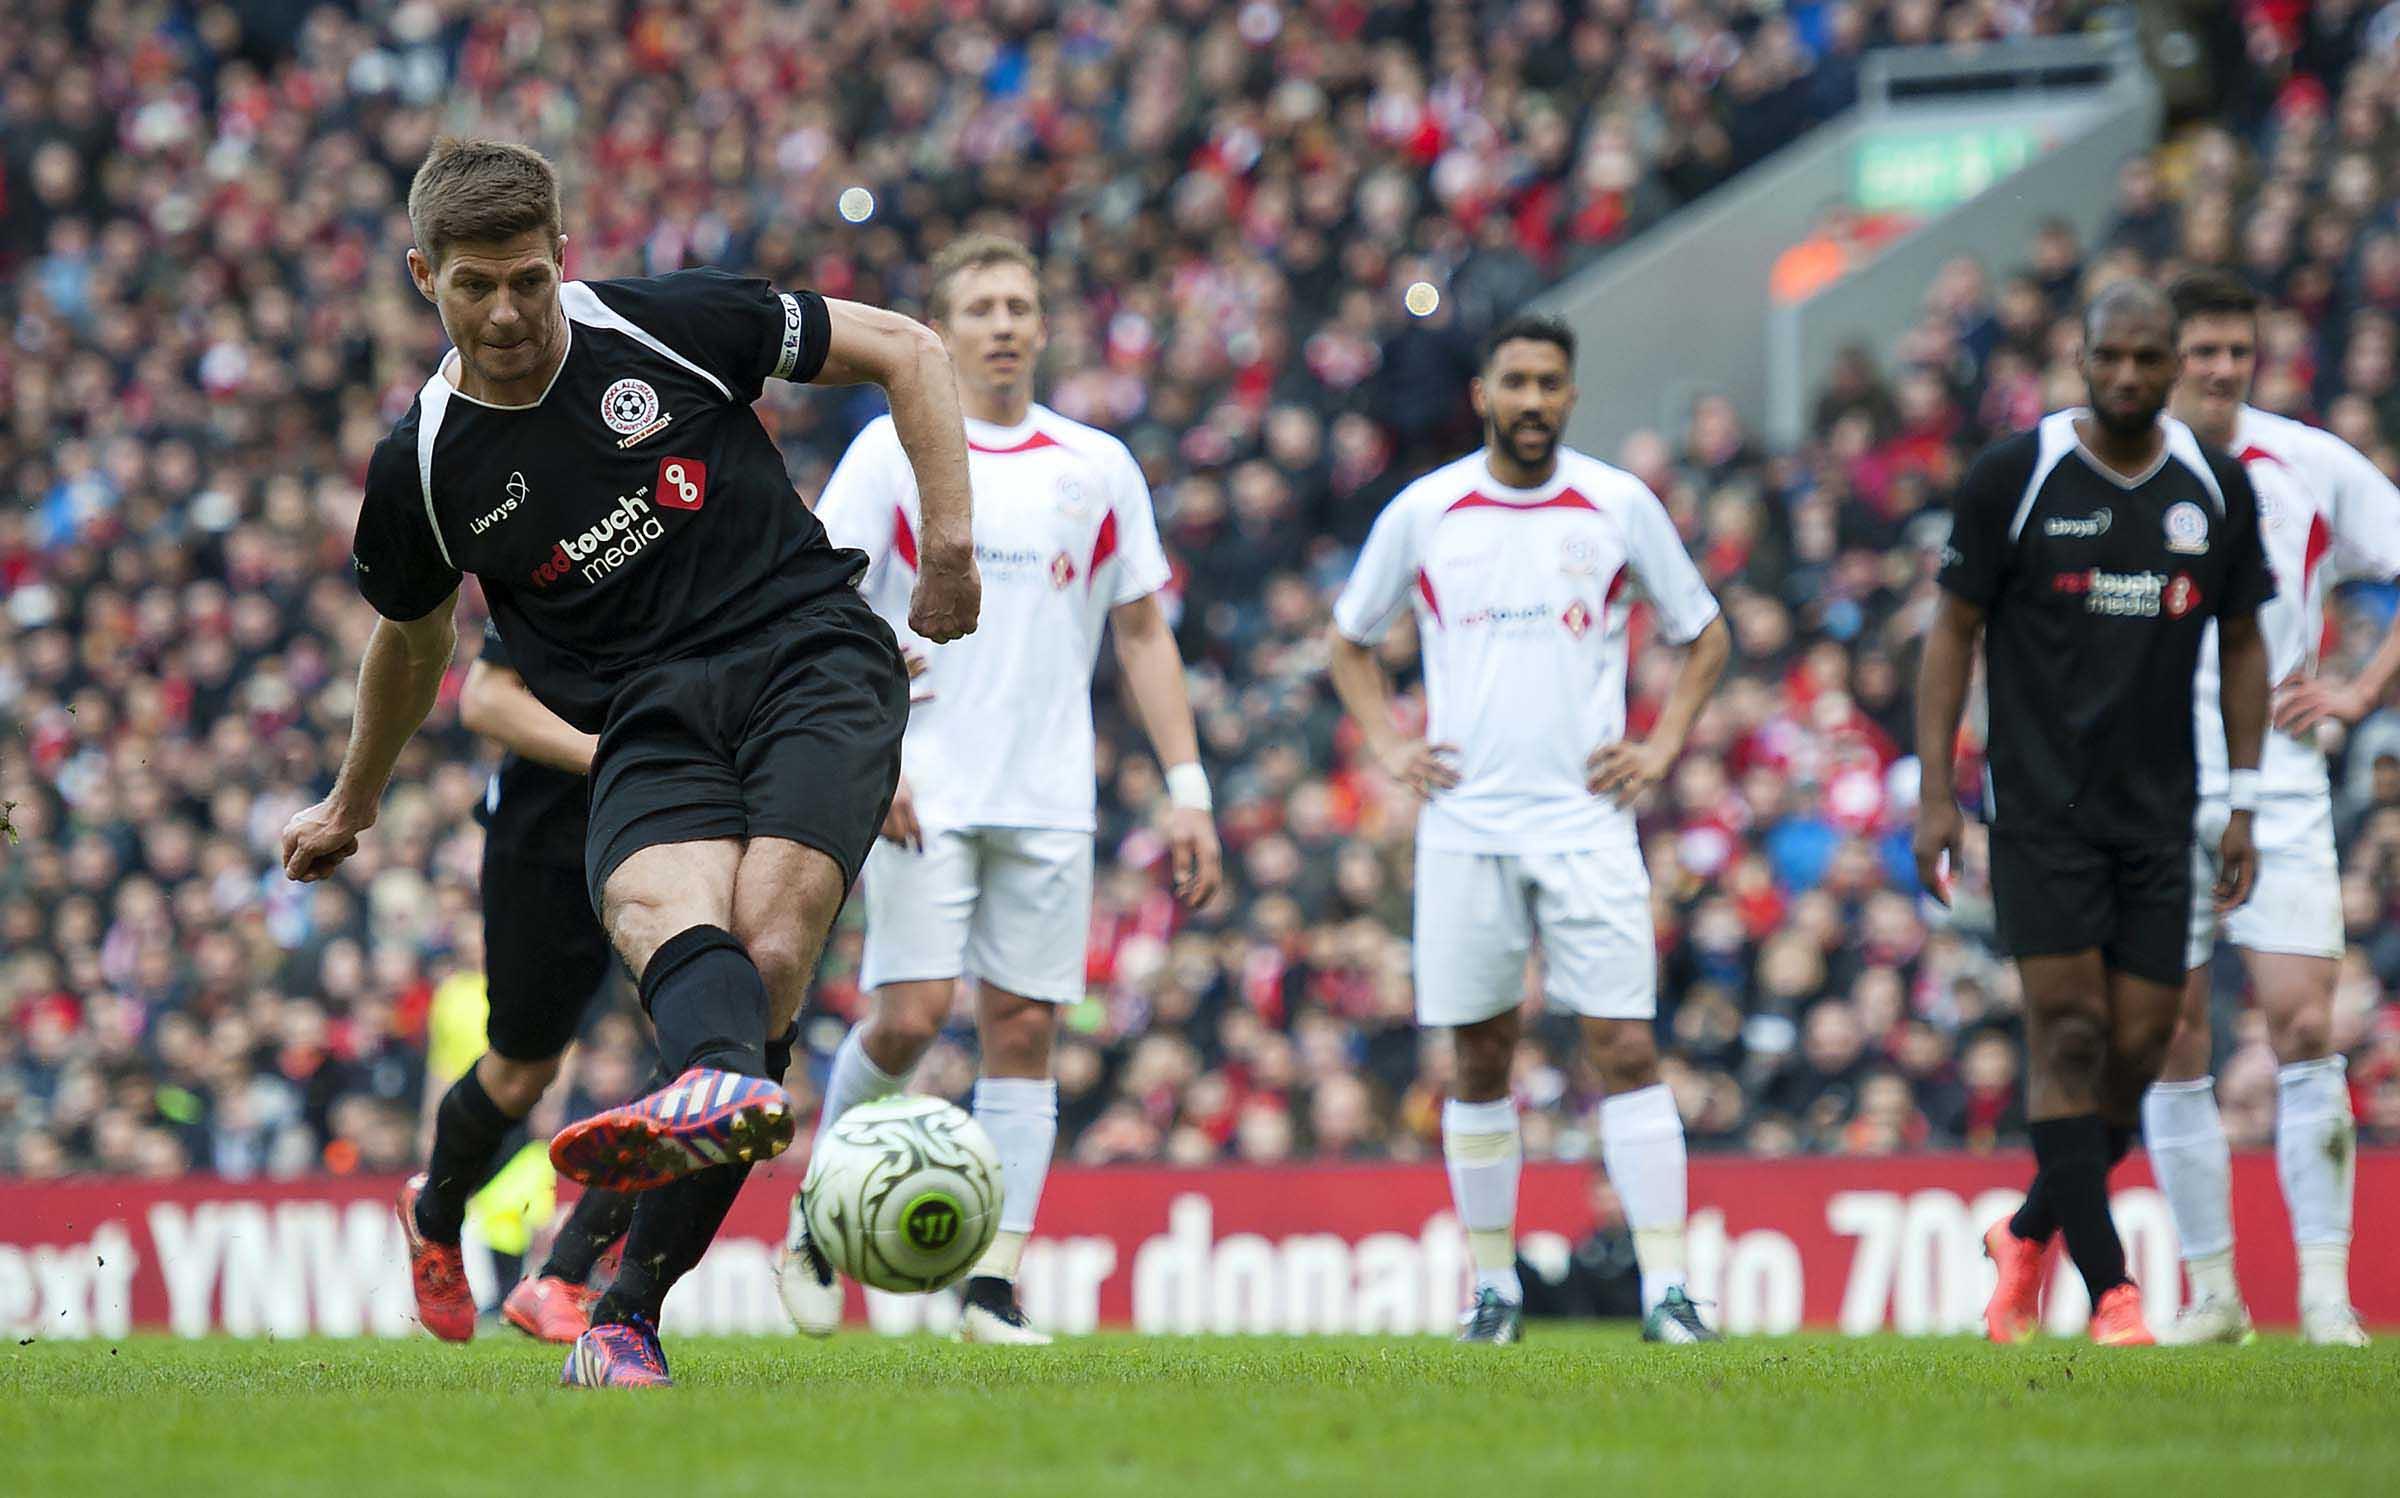 Football - Friendly - Liverpool FC All Star Charity Match - Gerrard XI v Carragher XI